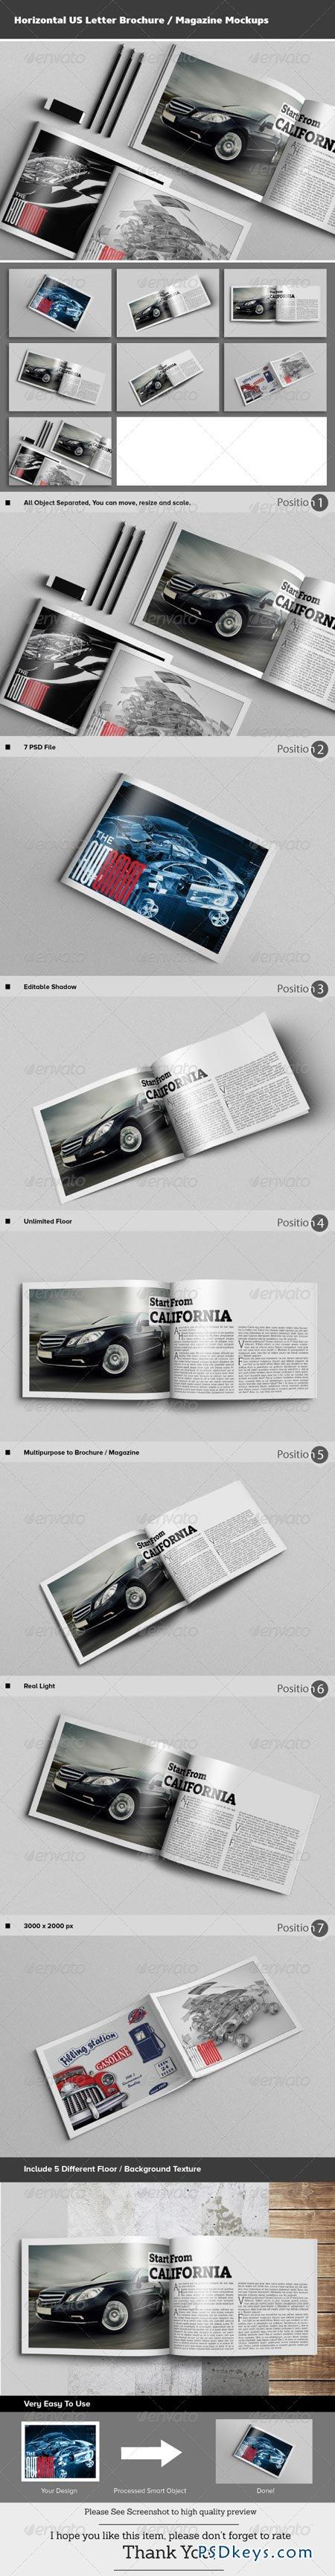 horizontal brochure template - horizontal us letter brochure magazine mockups 8506448